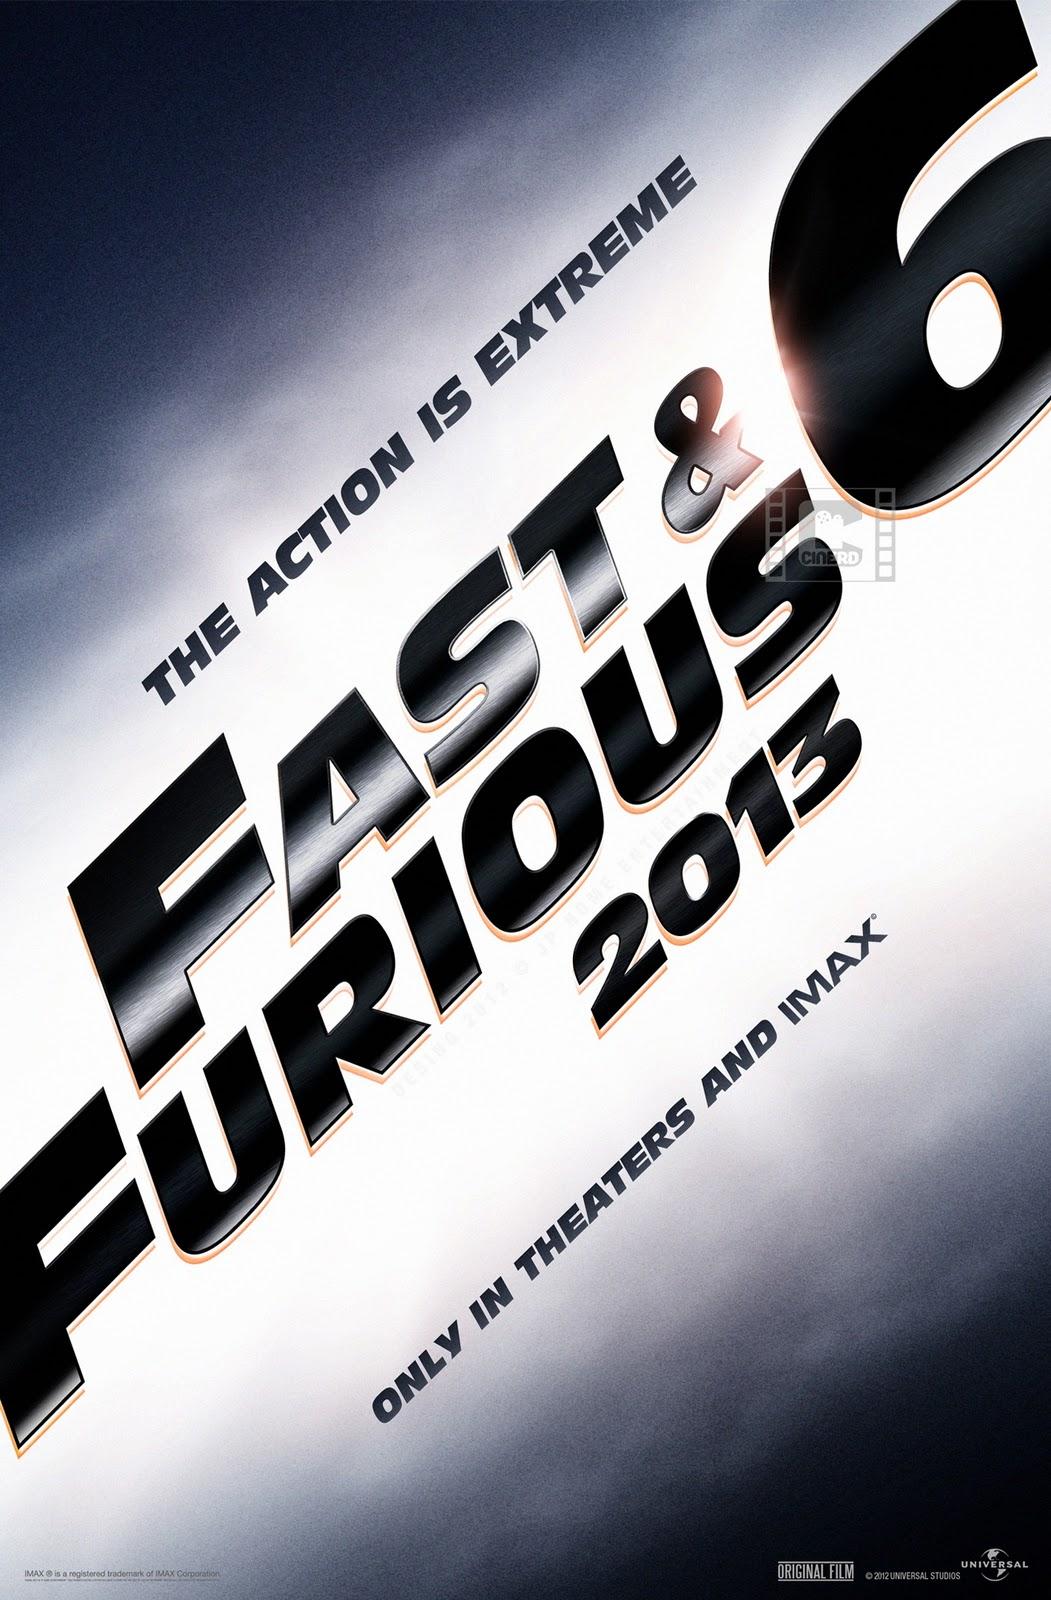 http://1.bp.blogspot.com/-n44ye-1KUf8/UABV_Q47NpI/AAAAAAAAEak/xqnechBIOzs/s1600/Fast_Furious_6_Teaser_Ing.jpg